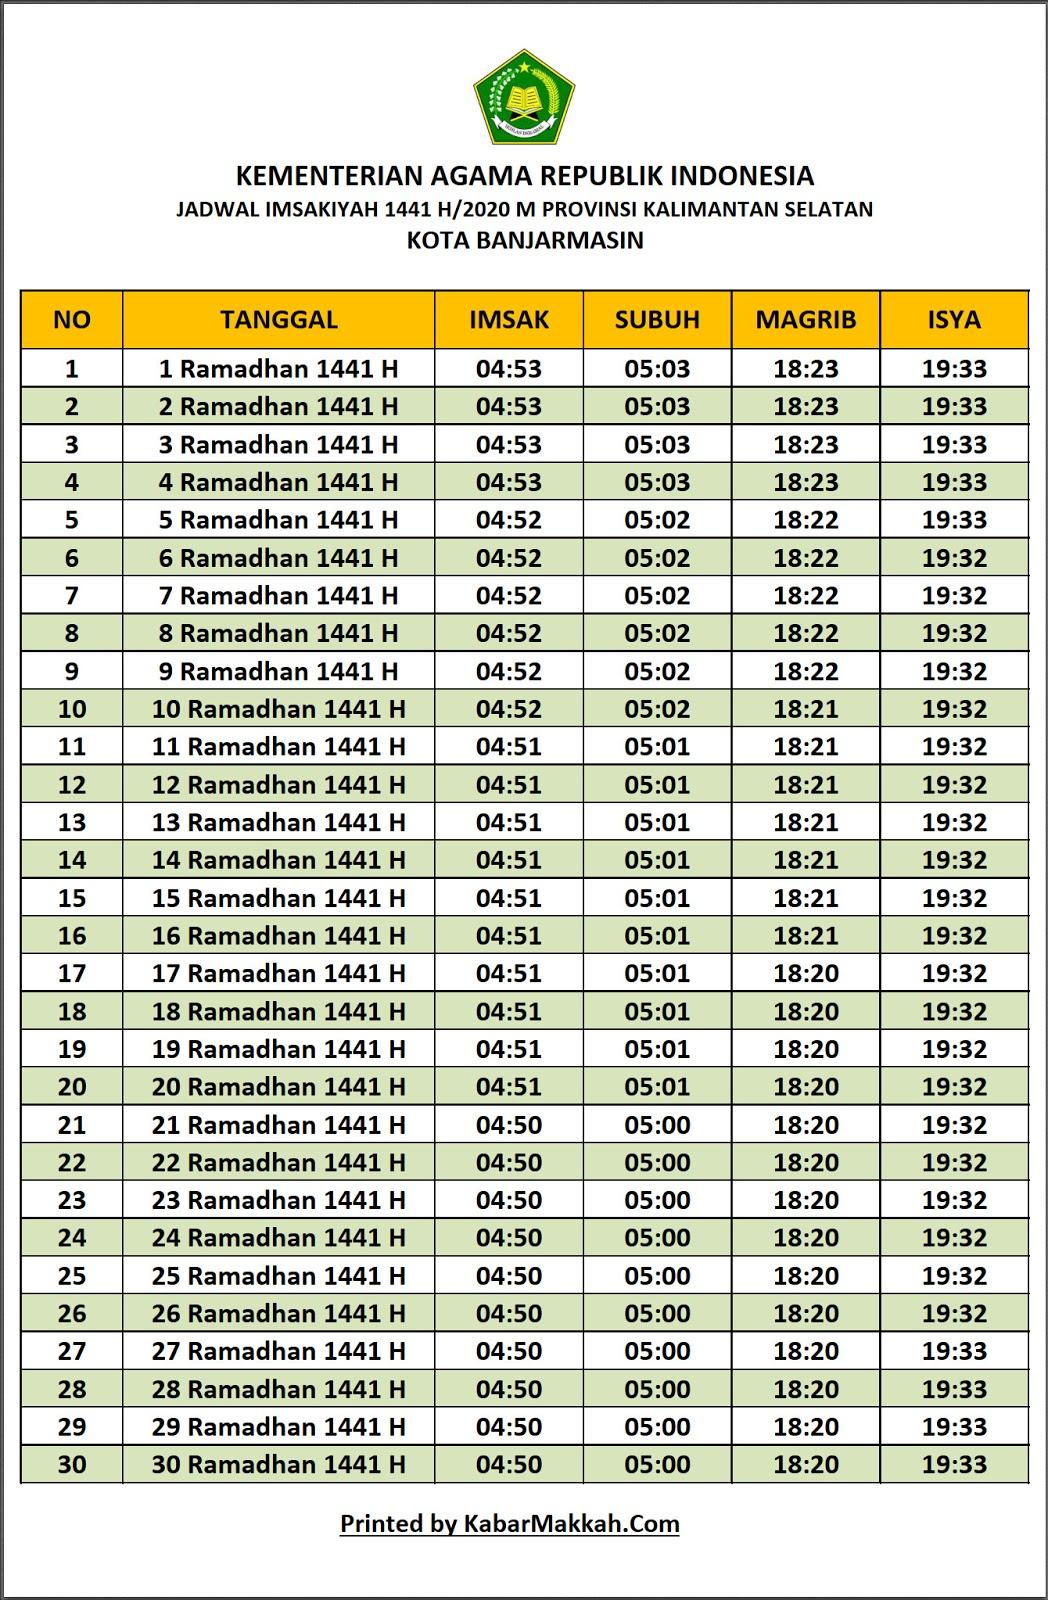 Jadwal Imsakiyah Banjarmasin 2020